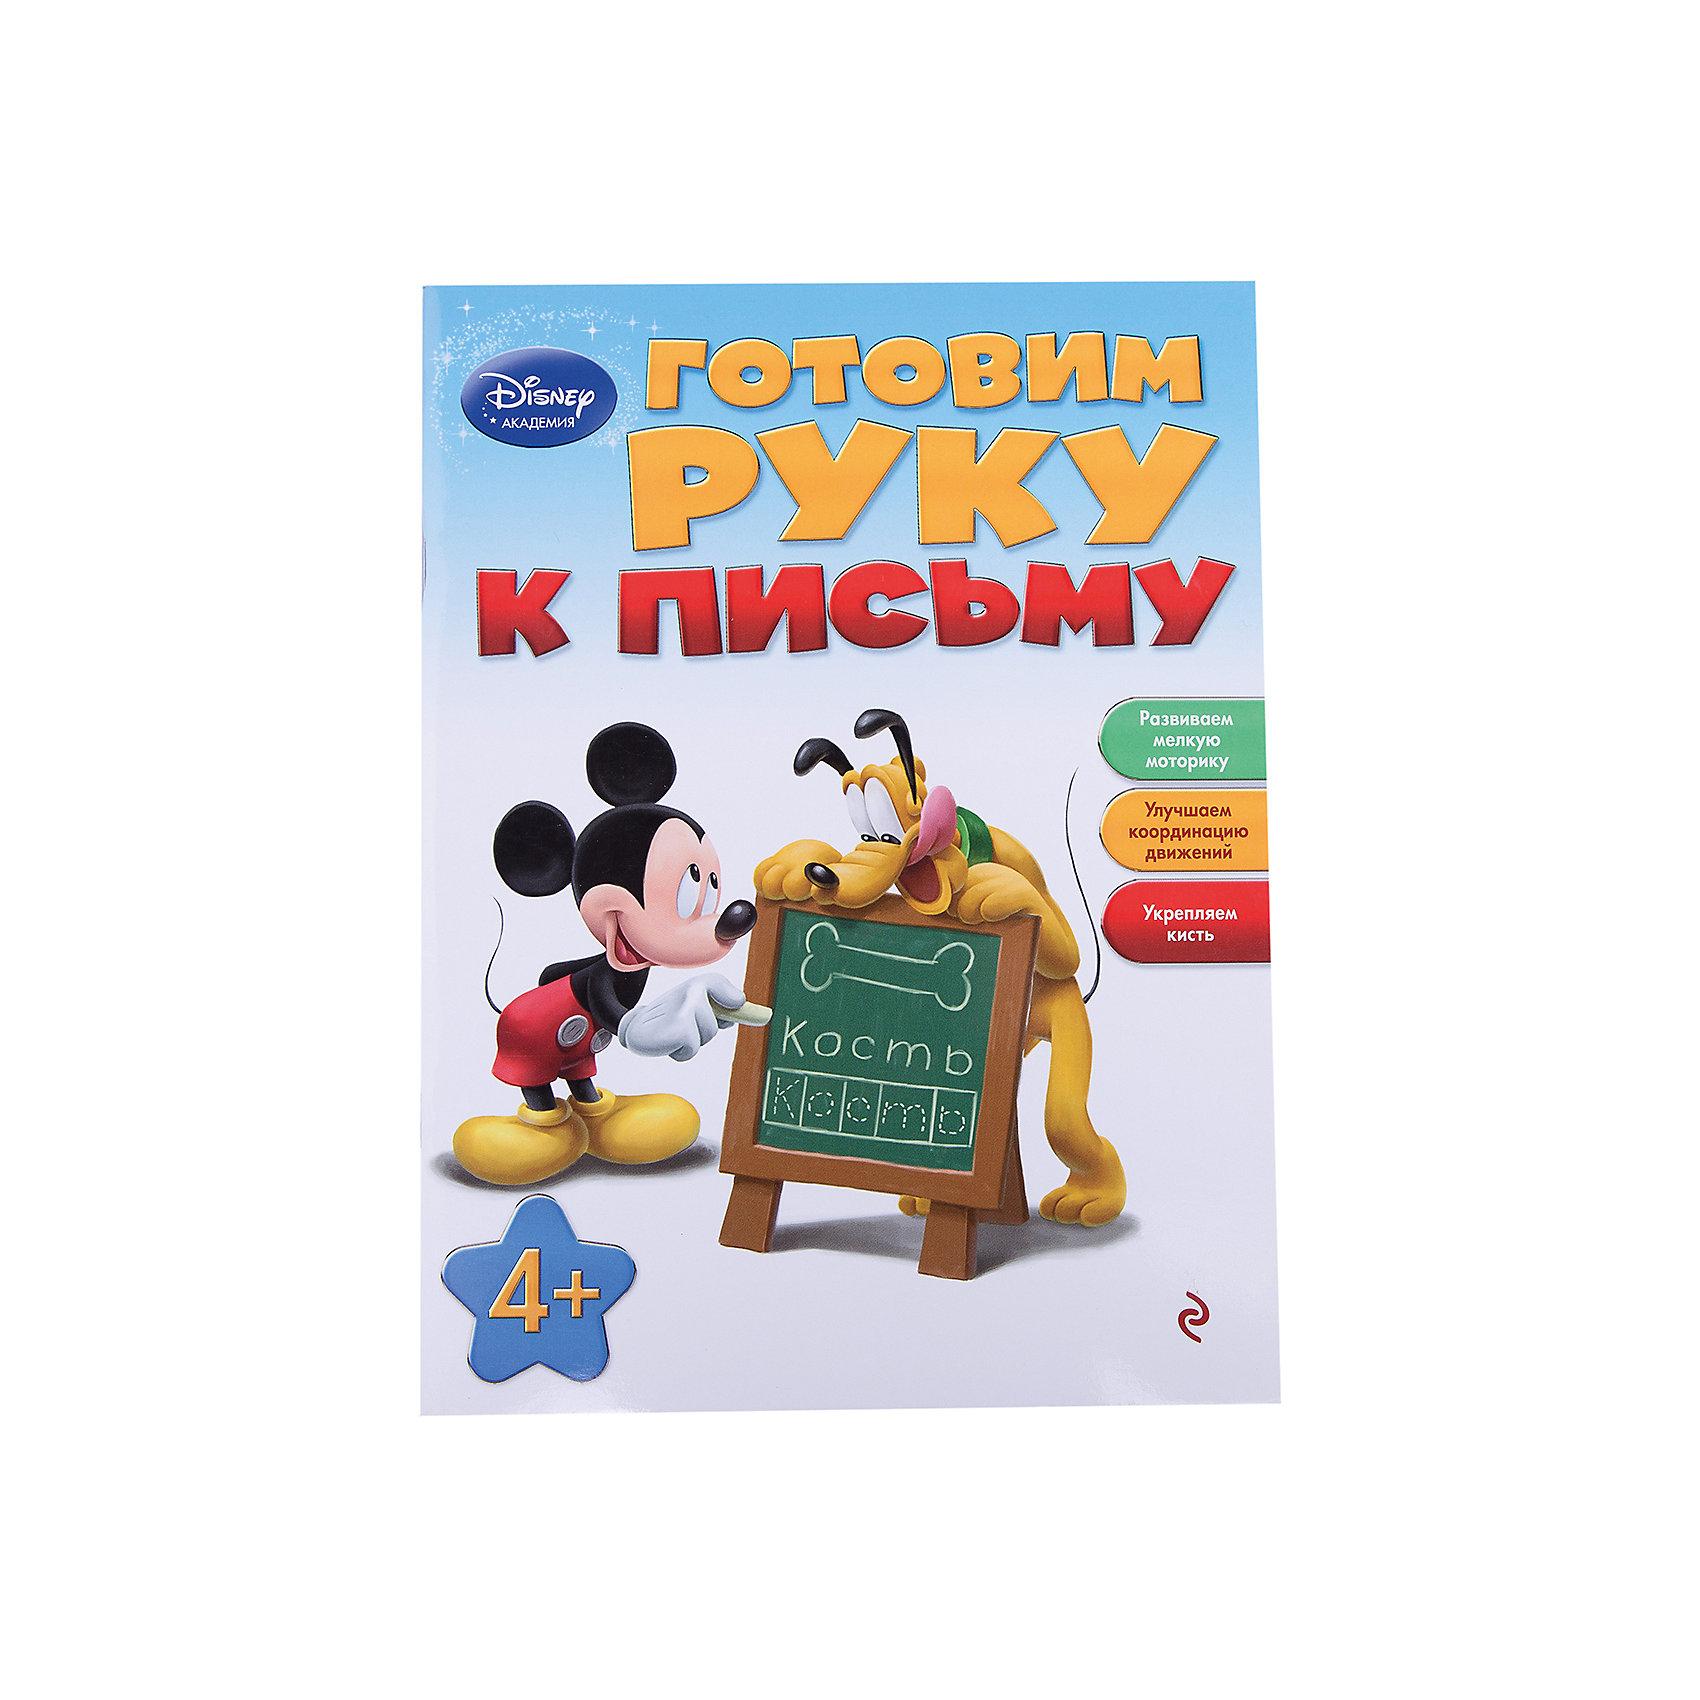 Эксмо Готовим руку к письму, Disney Академия учебники fajna тренажер прописи готовим руку к письму 3